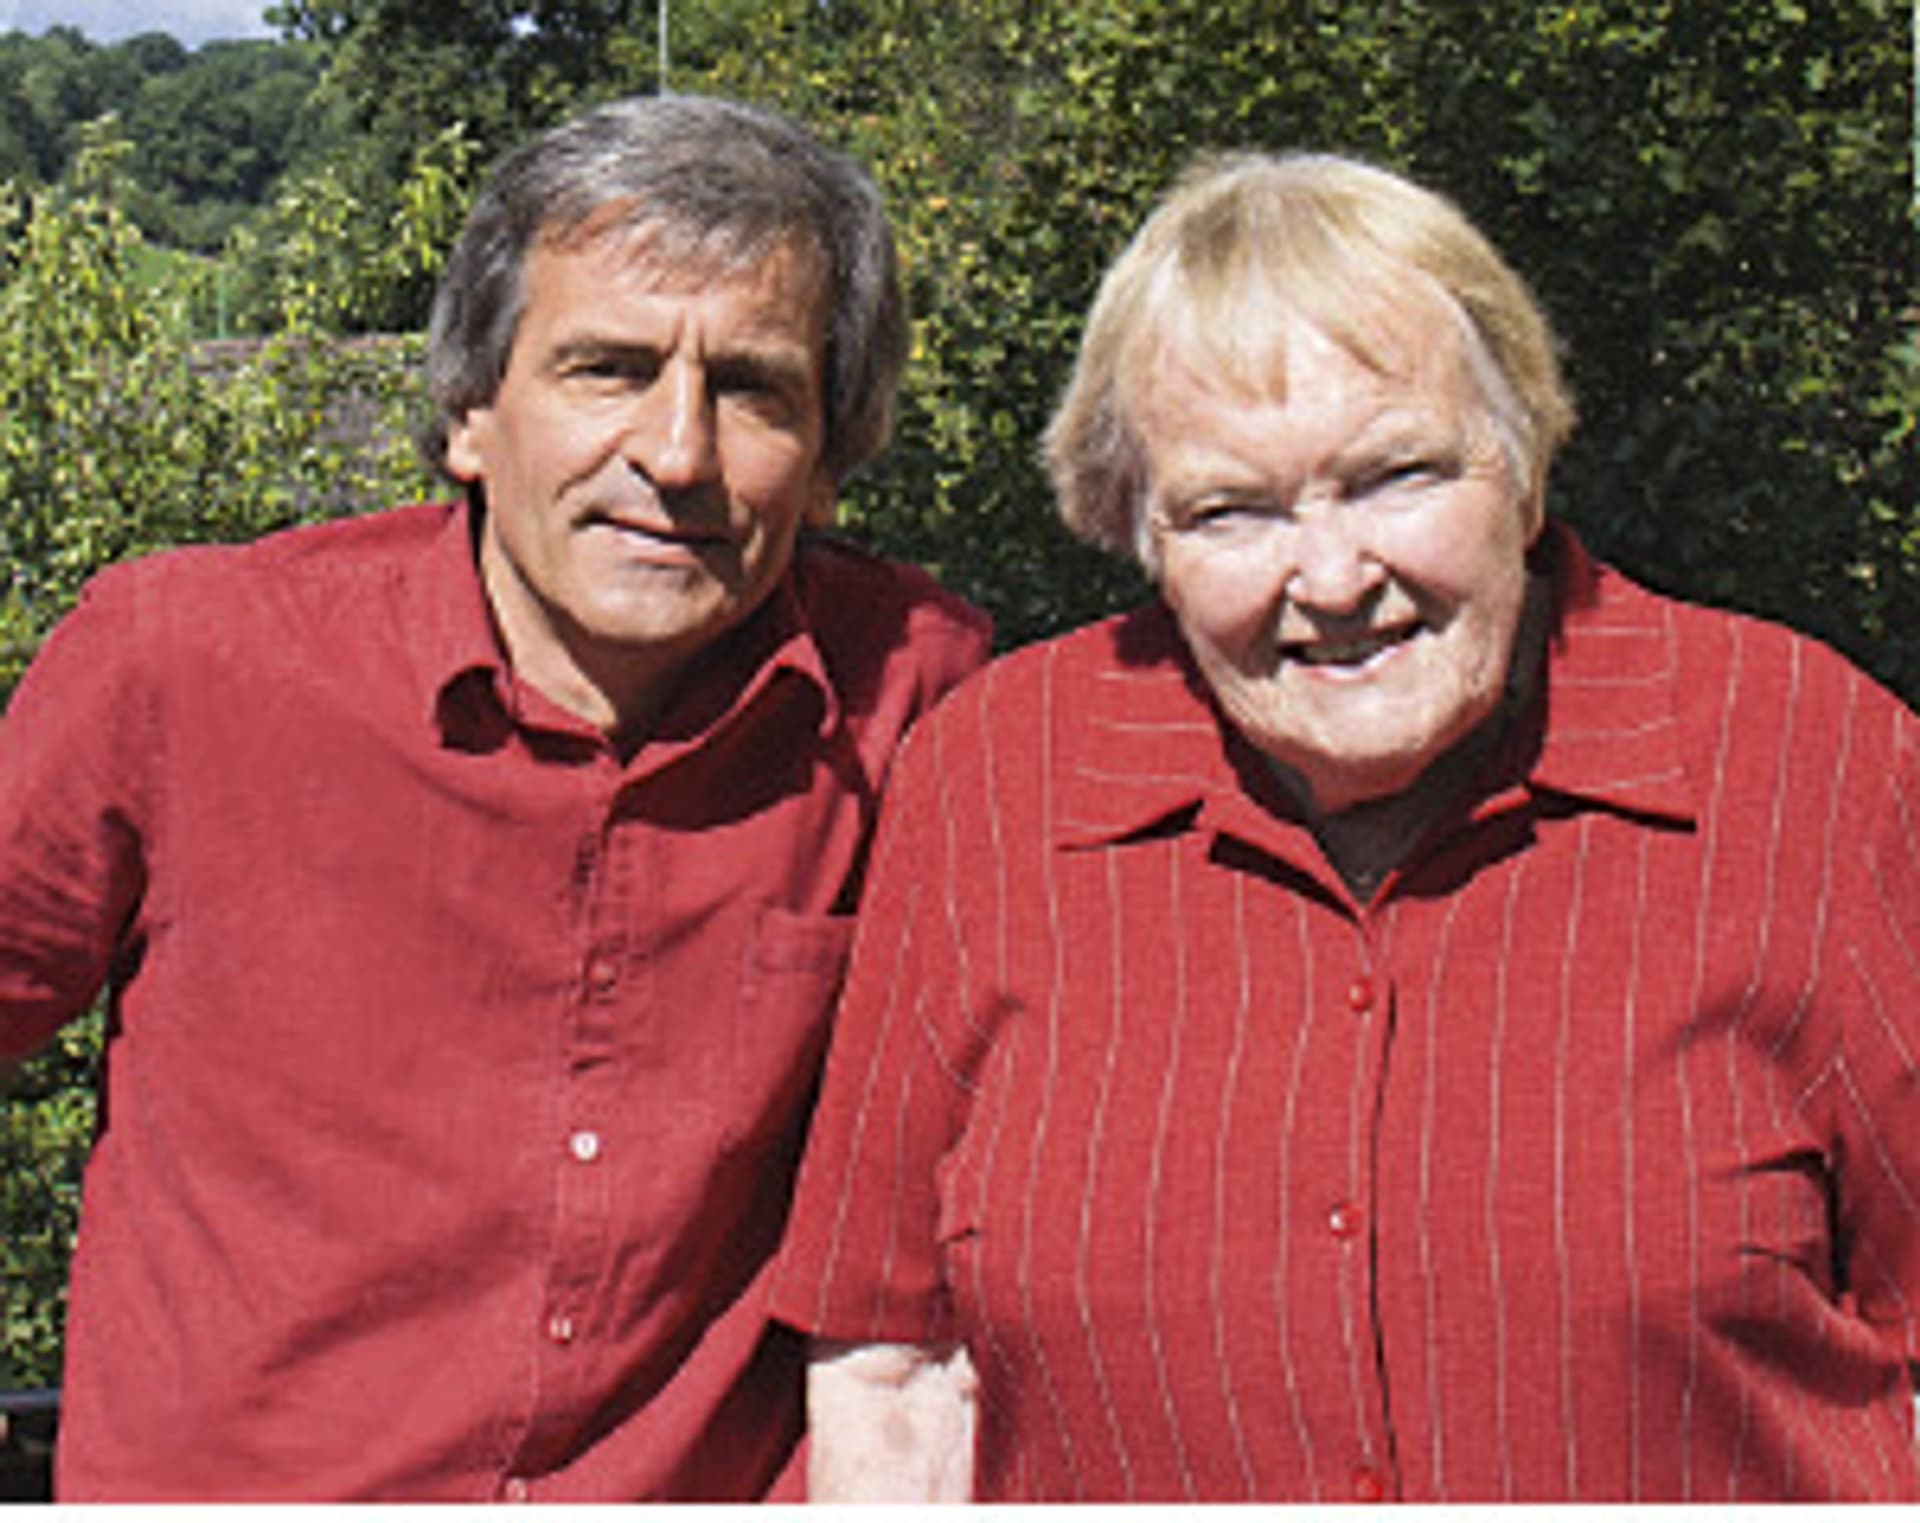 Manfred Loosen und Gudrun Pausewang (Foto: Privat)